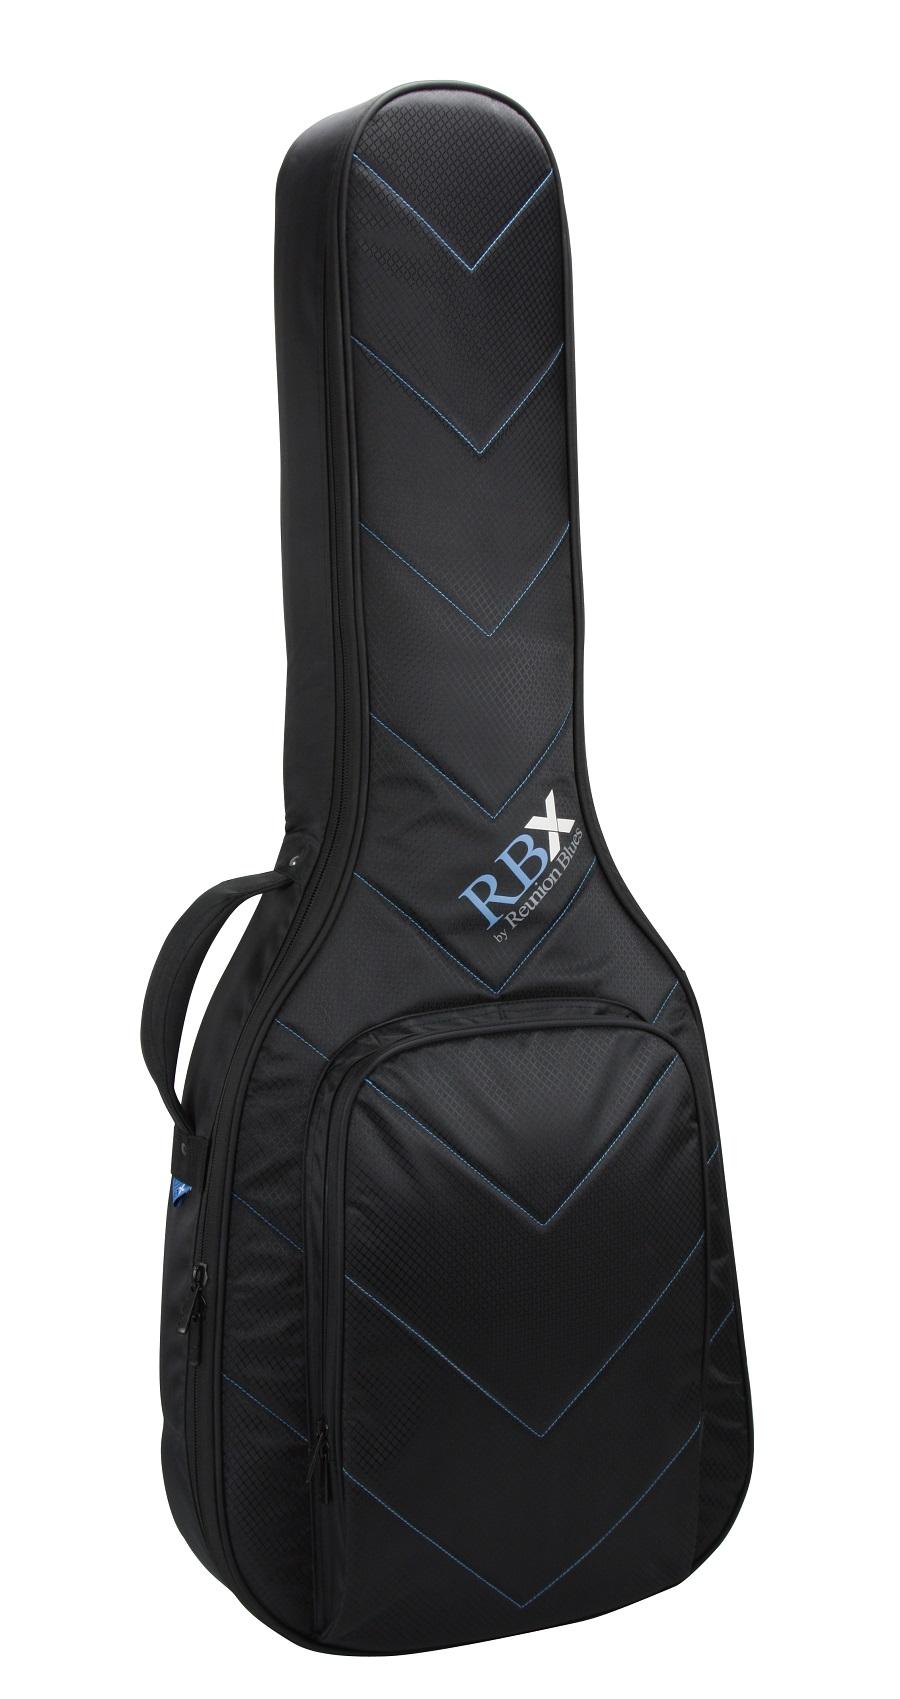 Rbx-335